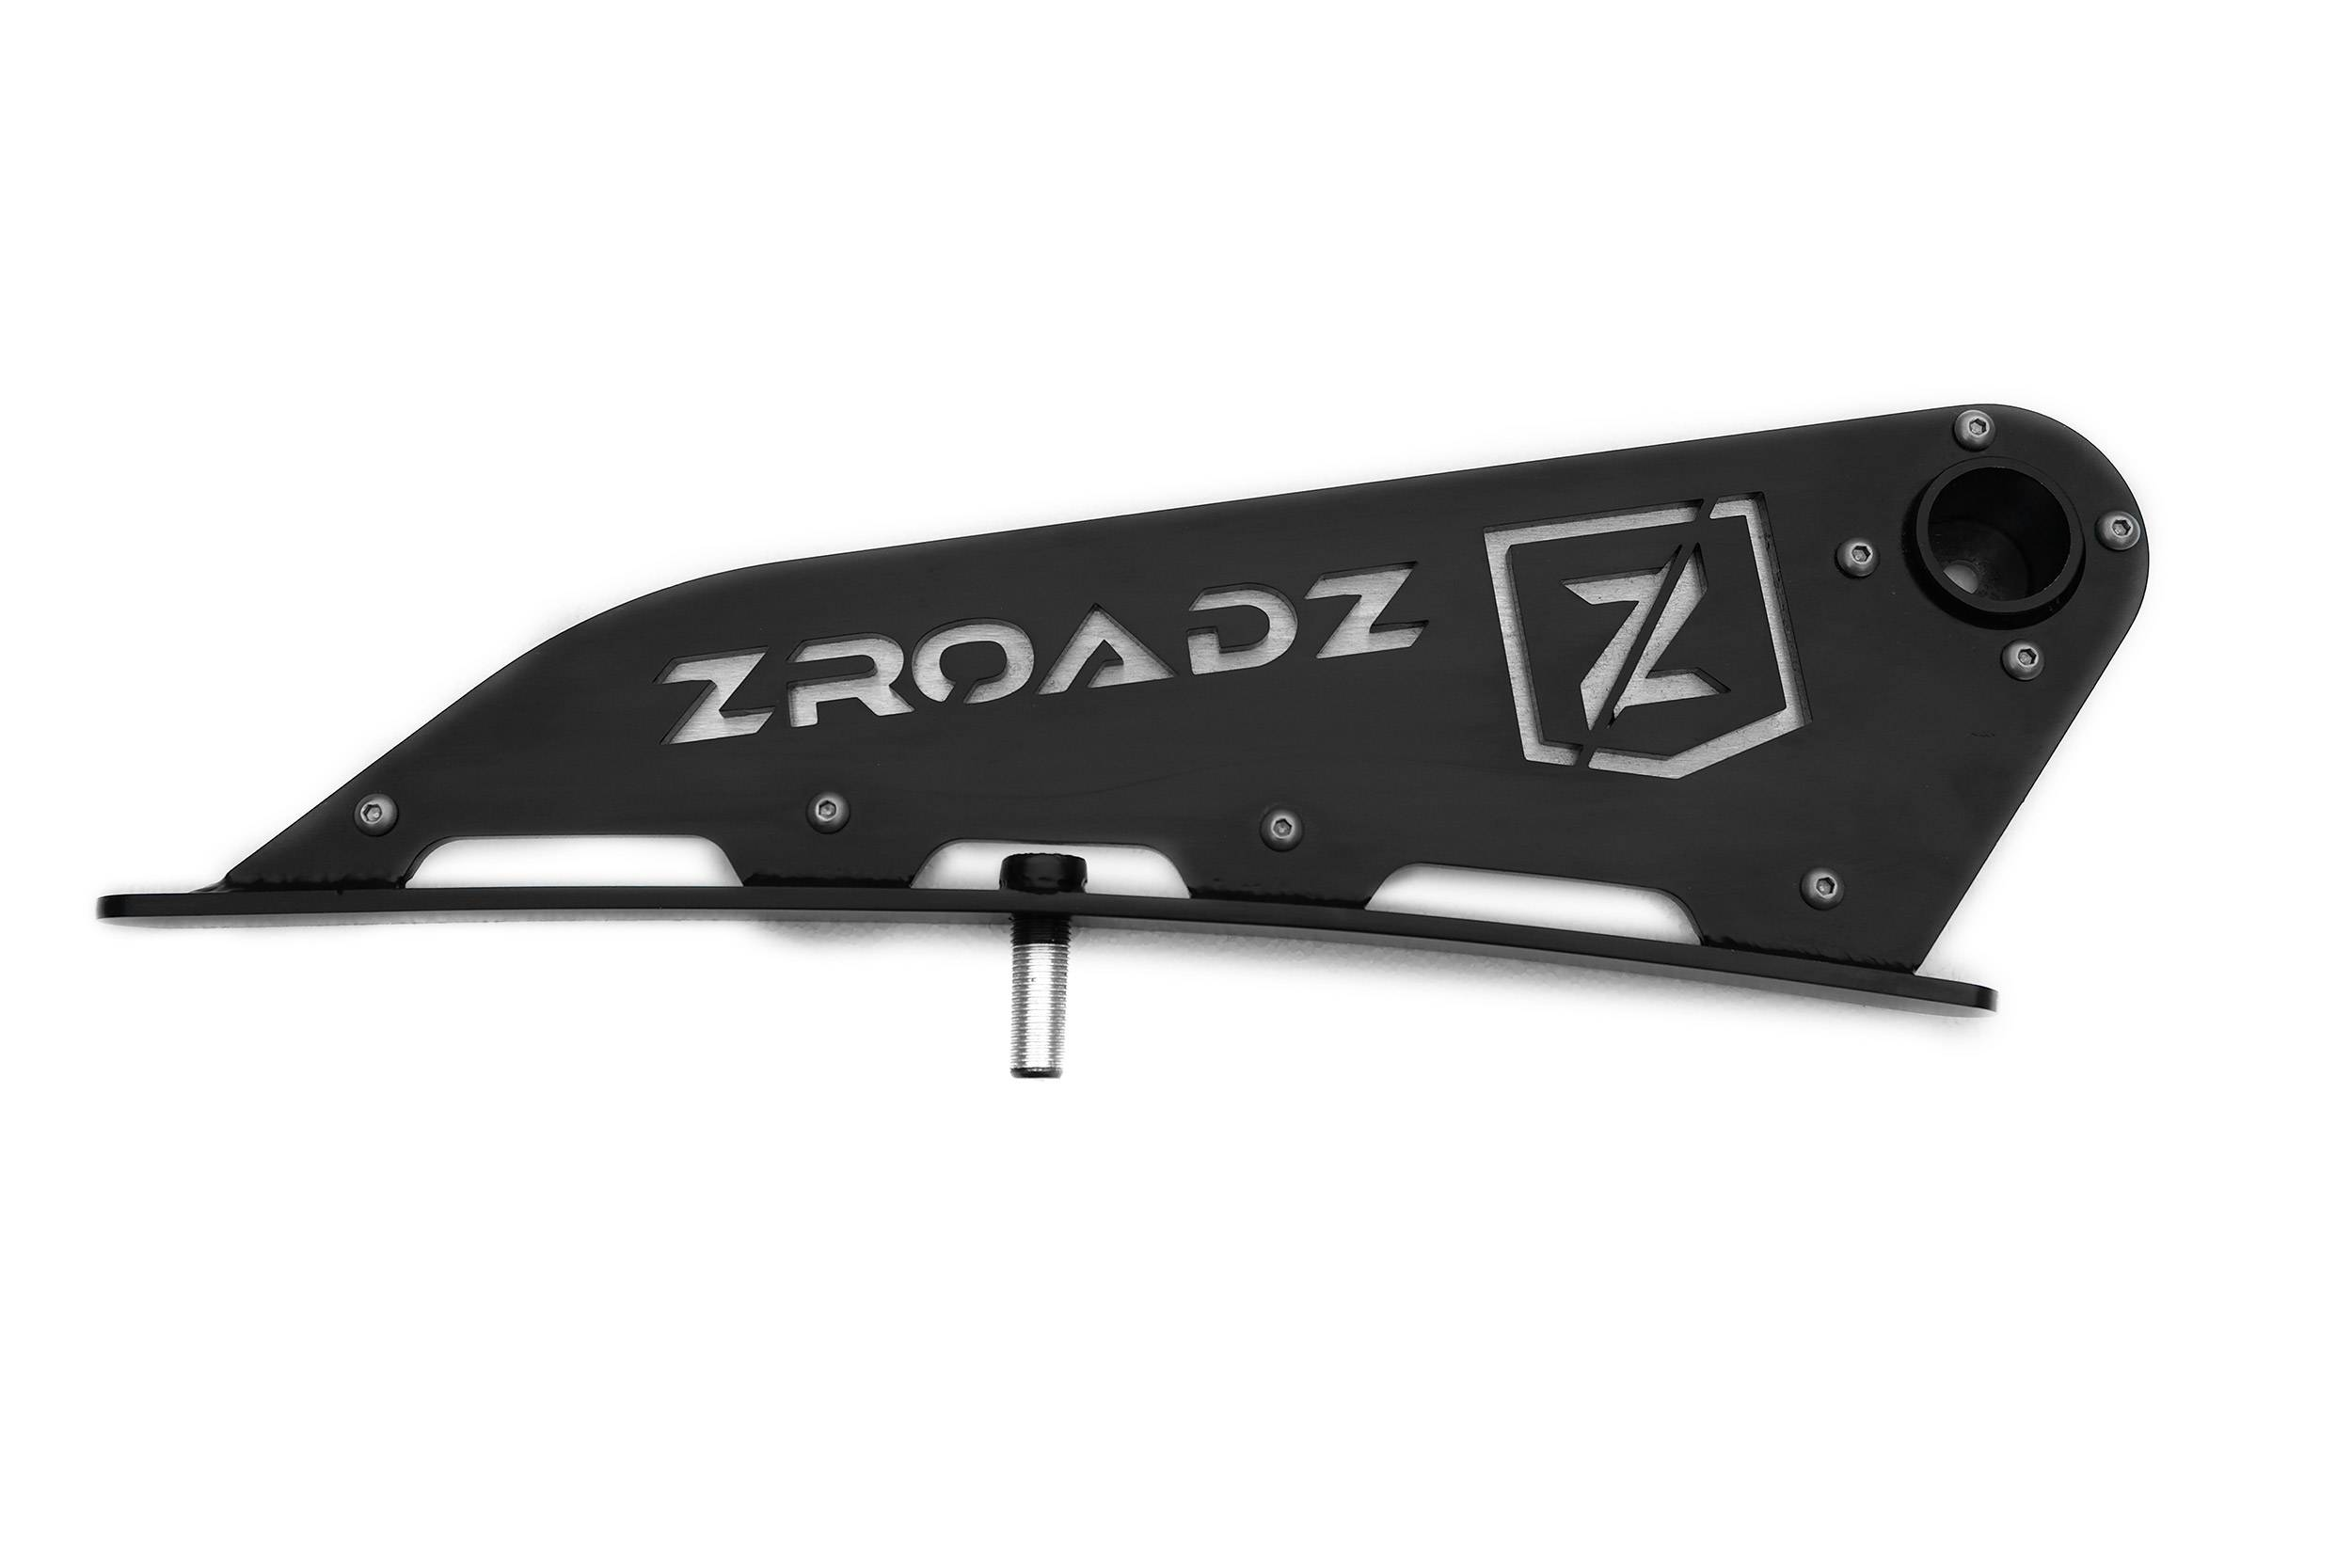 2019 Ram 1500 Front Roof LED Bracket to mount (1) 50 Inch Straight LED Light Bar - PN #Z334121